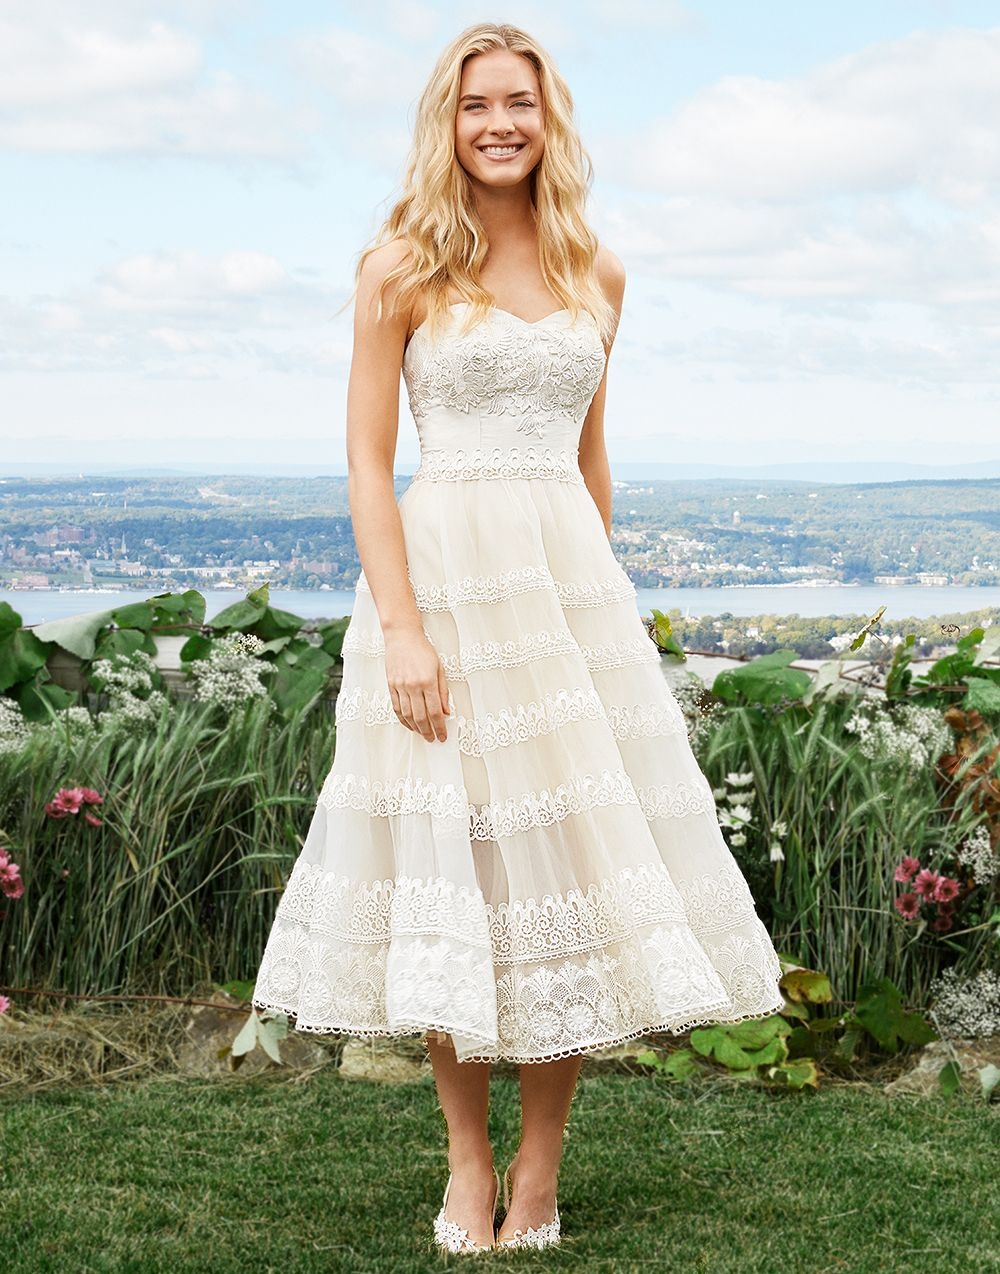 Western Tea Length Wedding Dresses Wedding Dresses dressesss 86dbcb5b3cc8